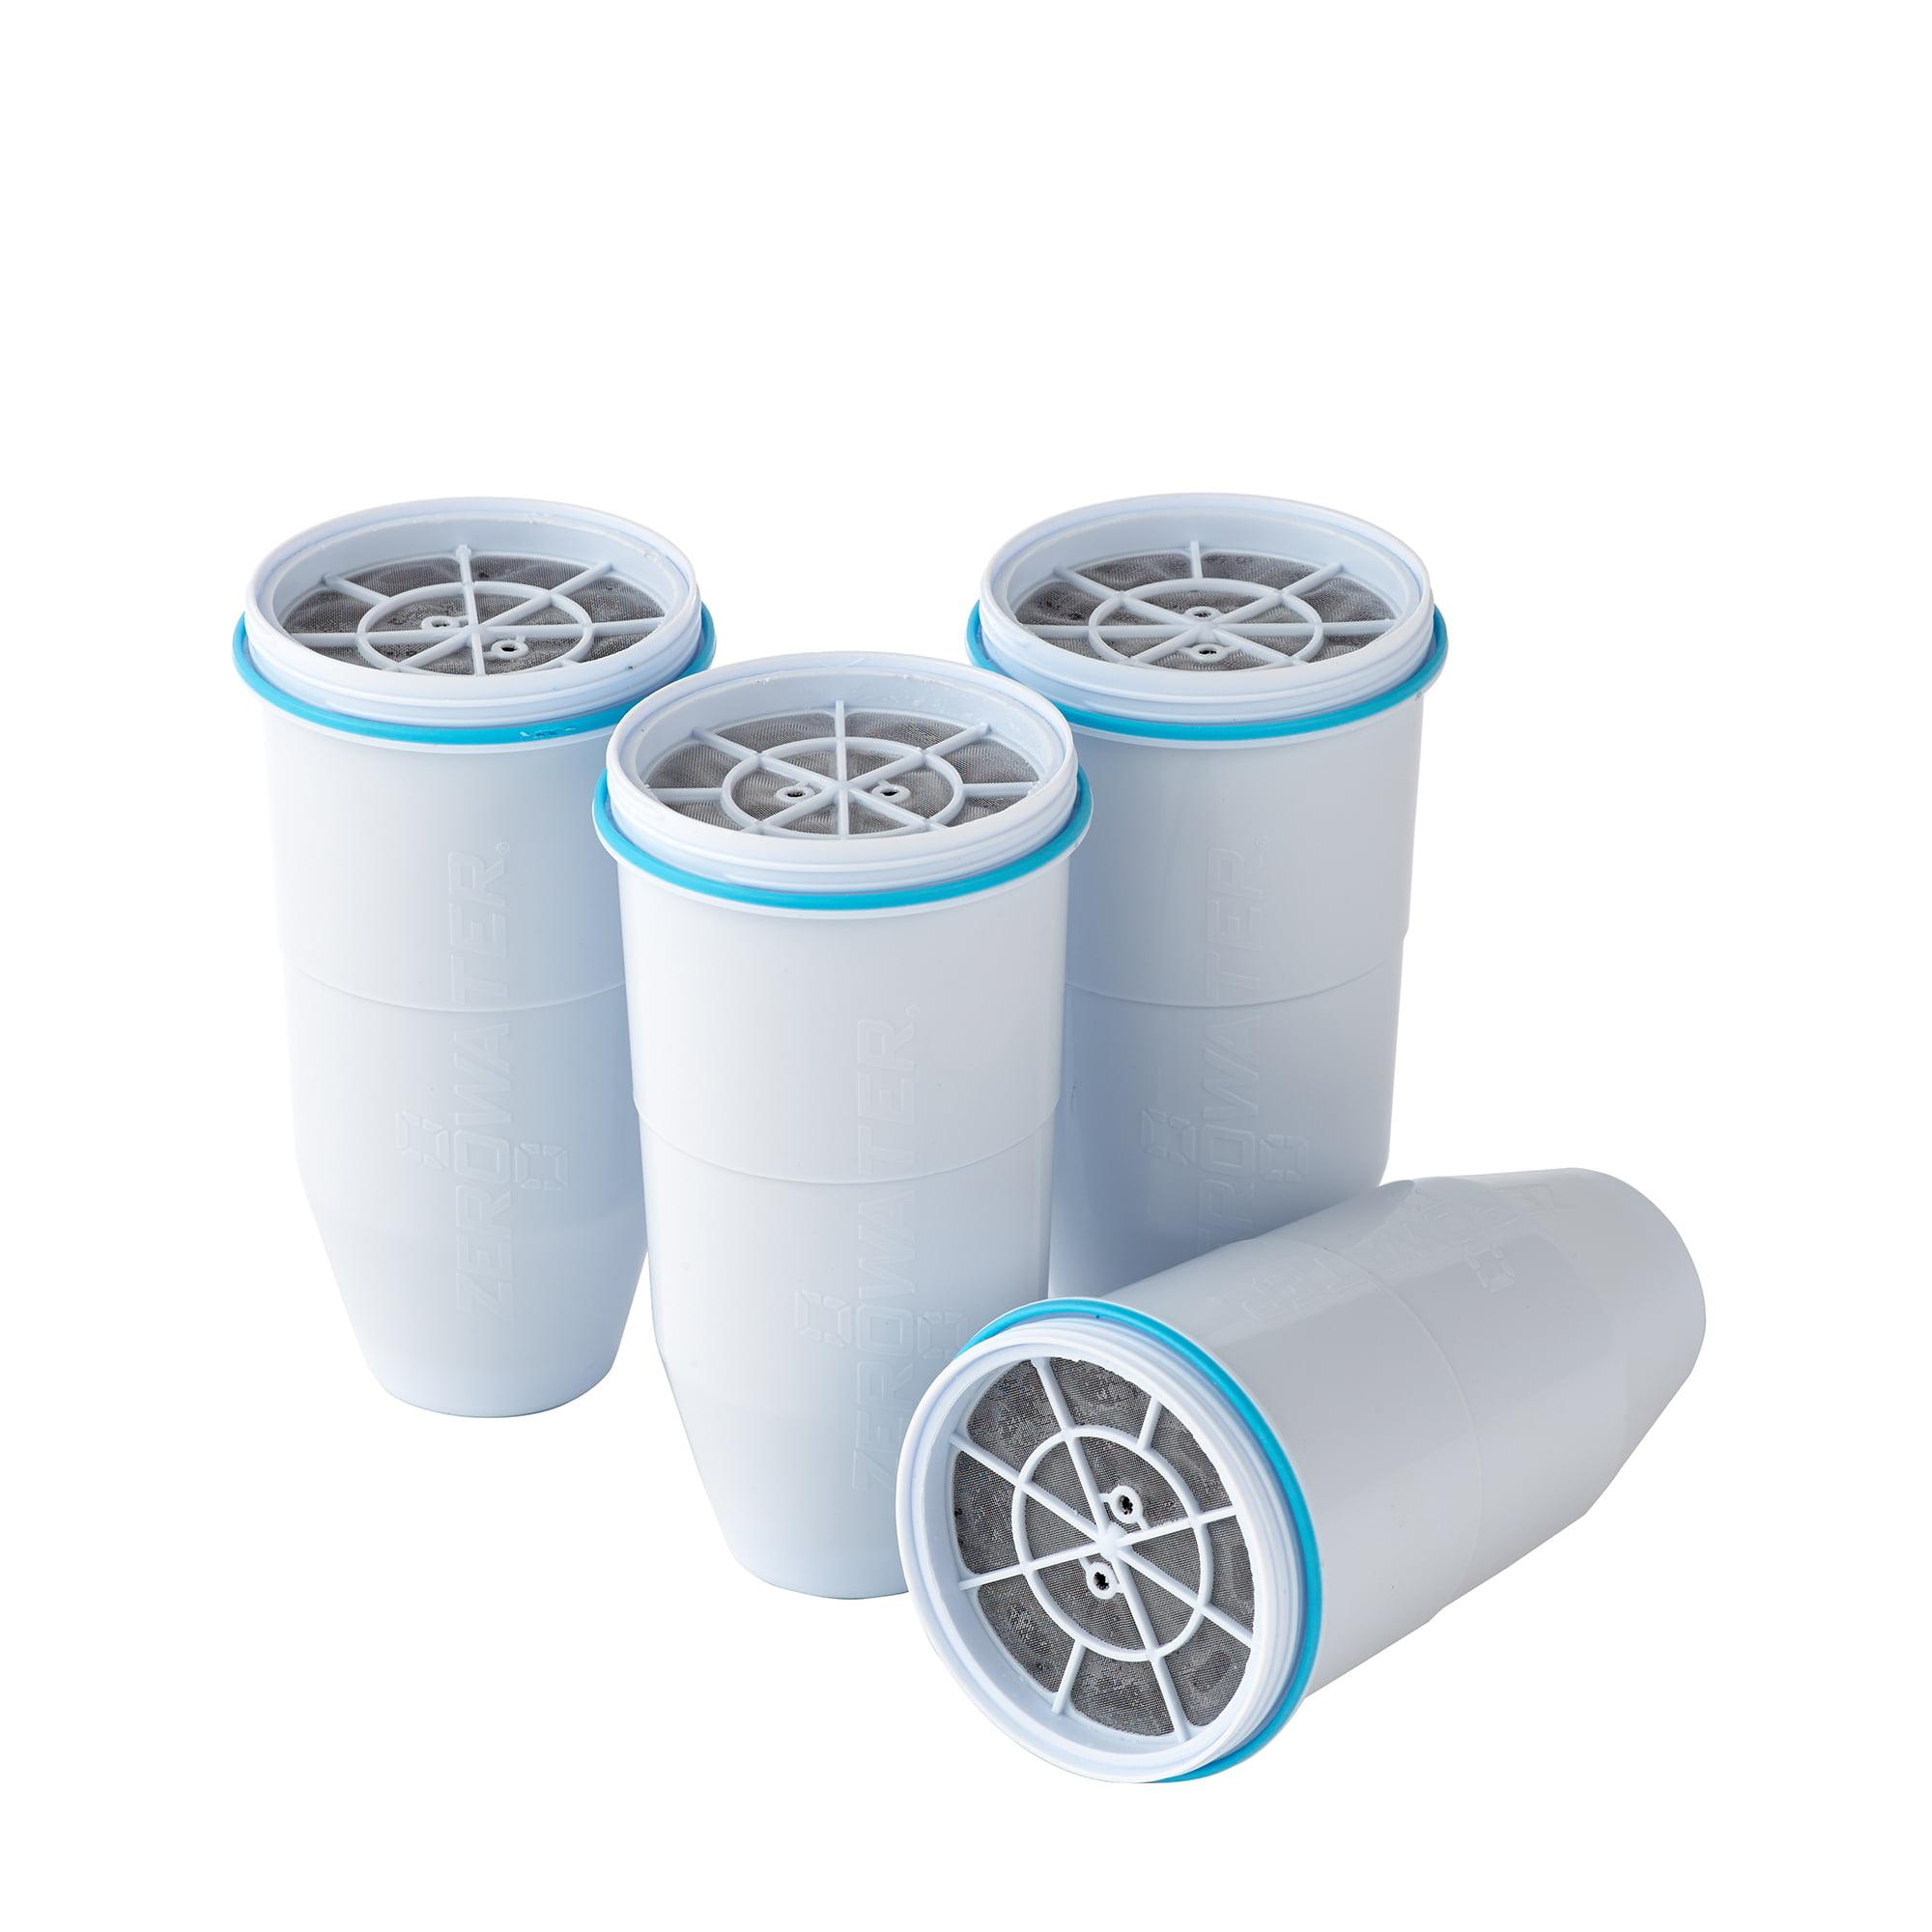 Refrigerator Water Filter for KitchenAid KSCS25FKSS00